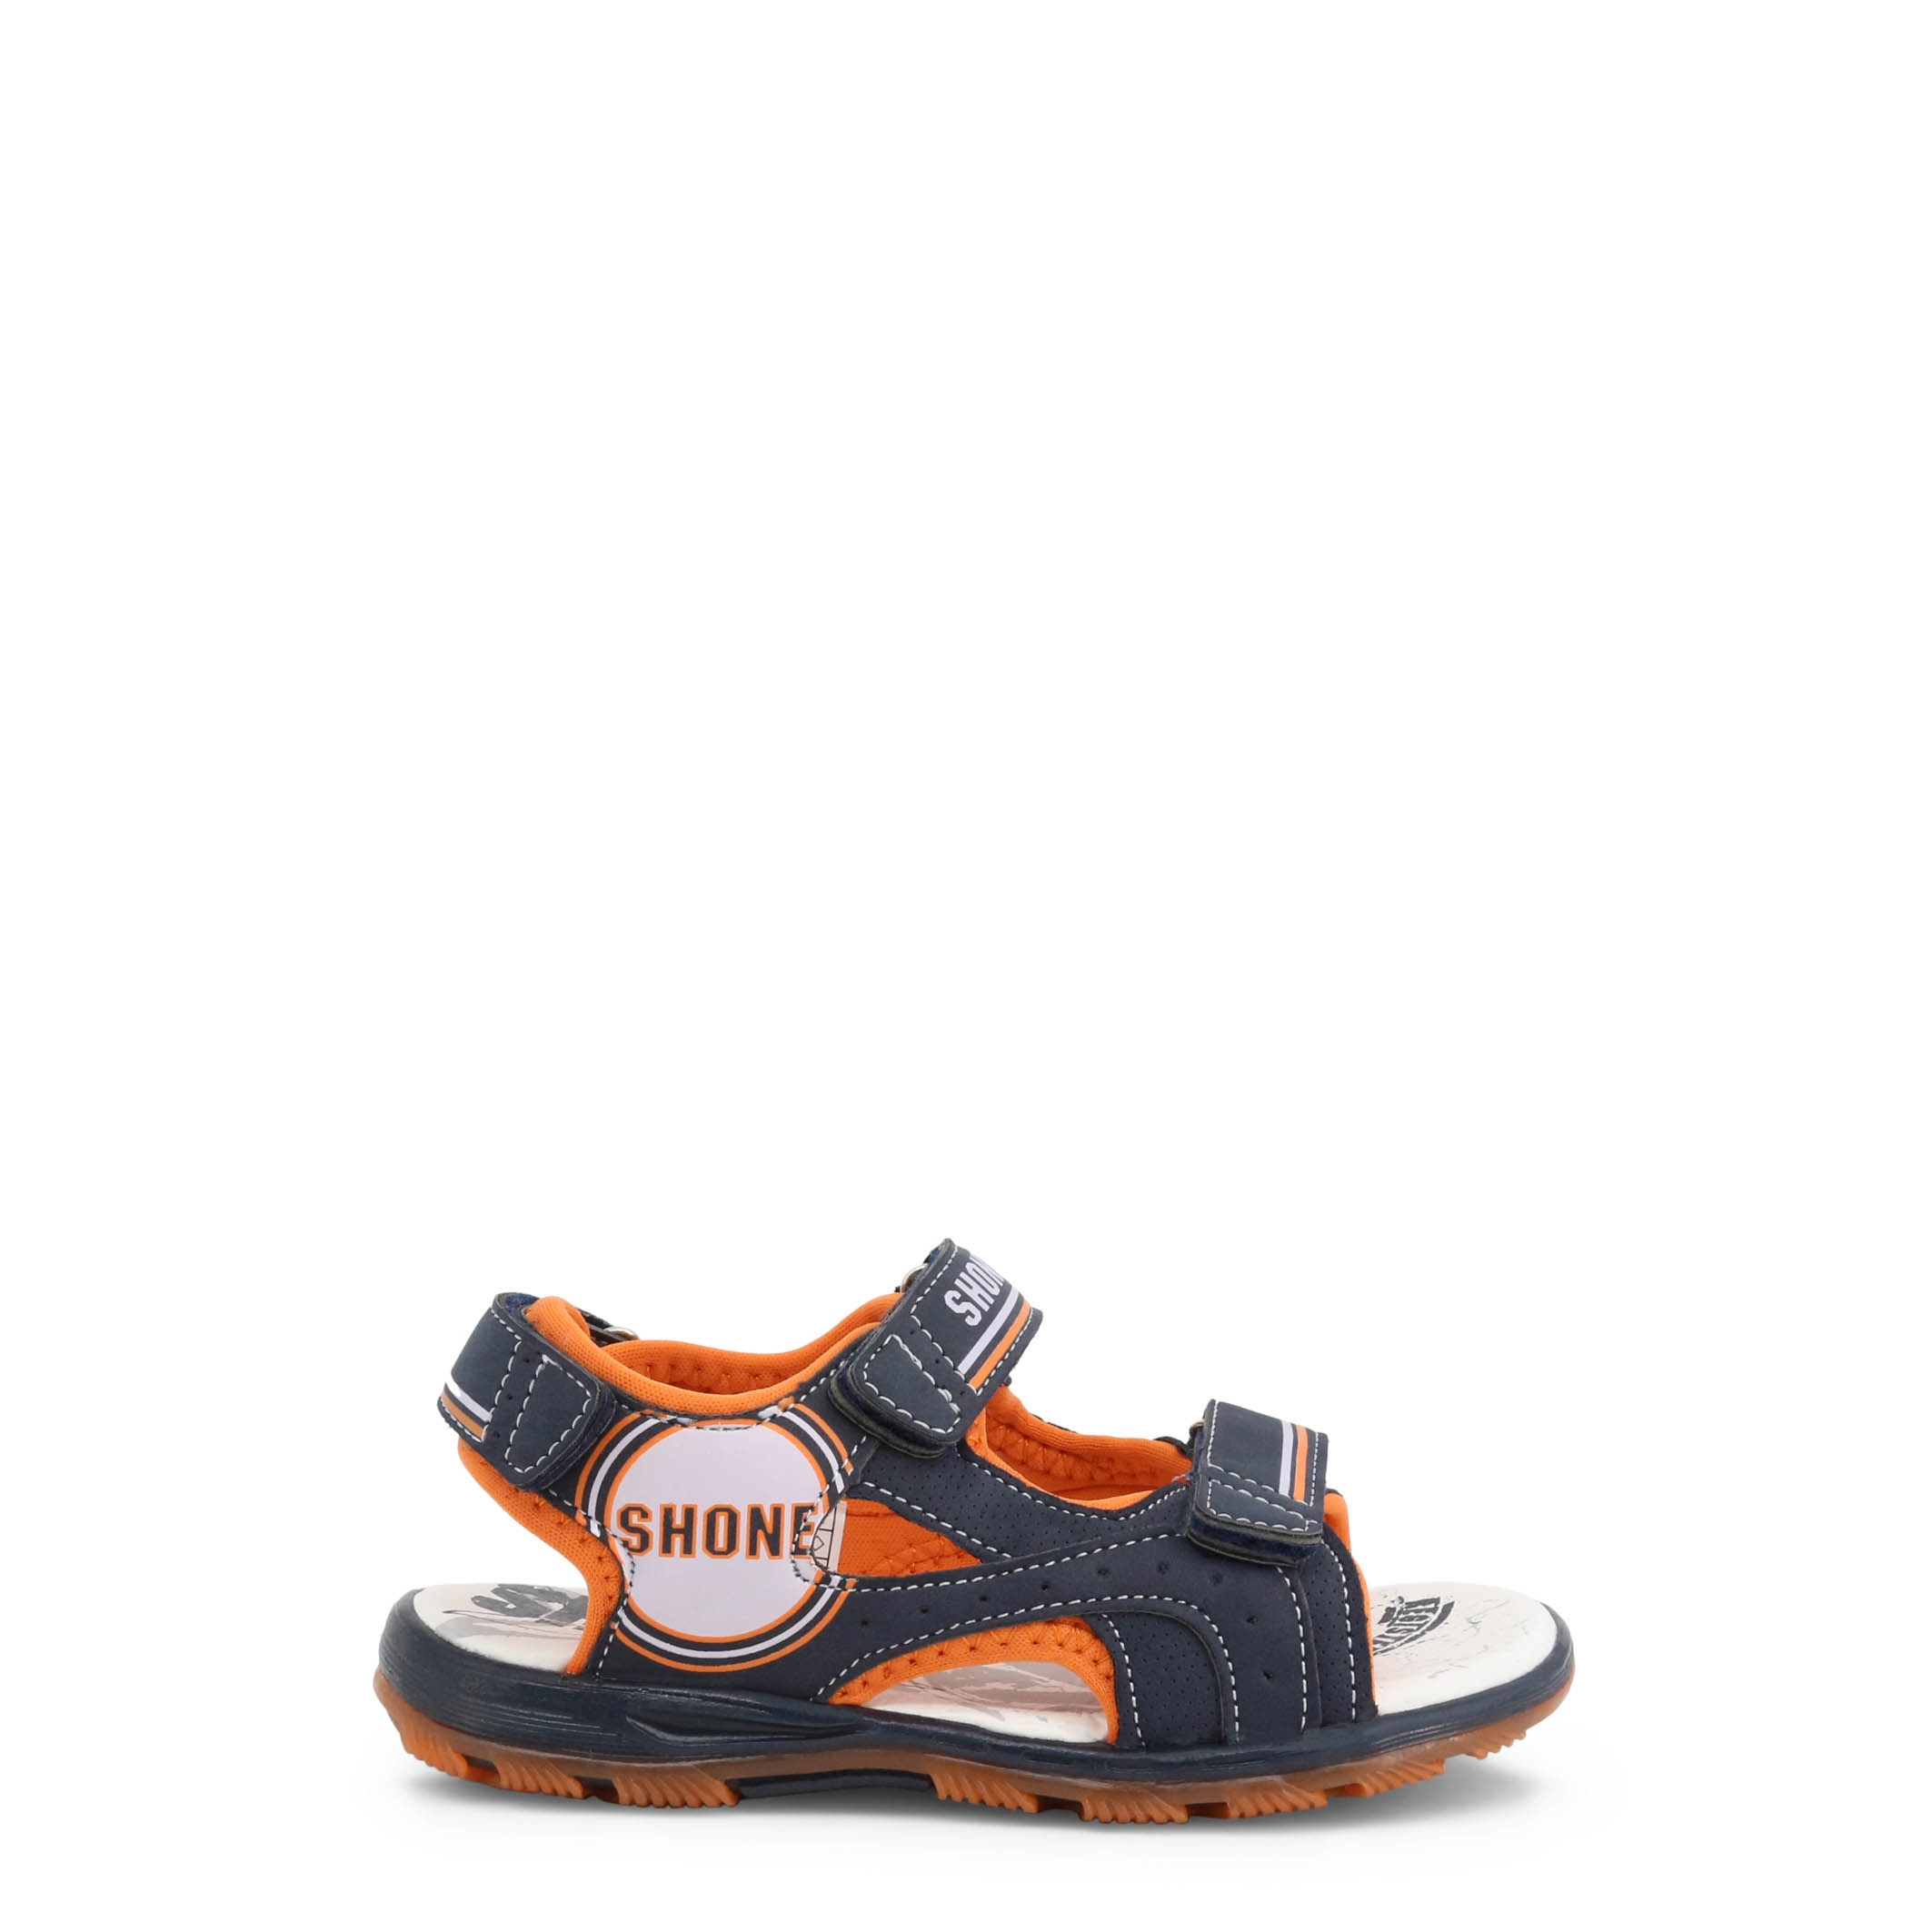 Sandale Shone 6015-028 Albastru